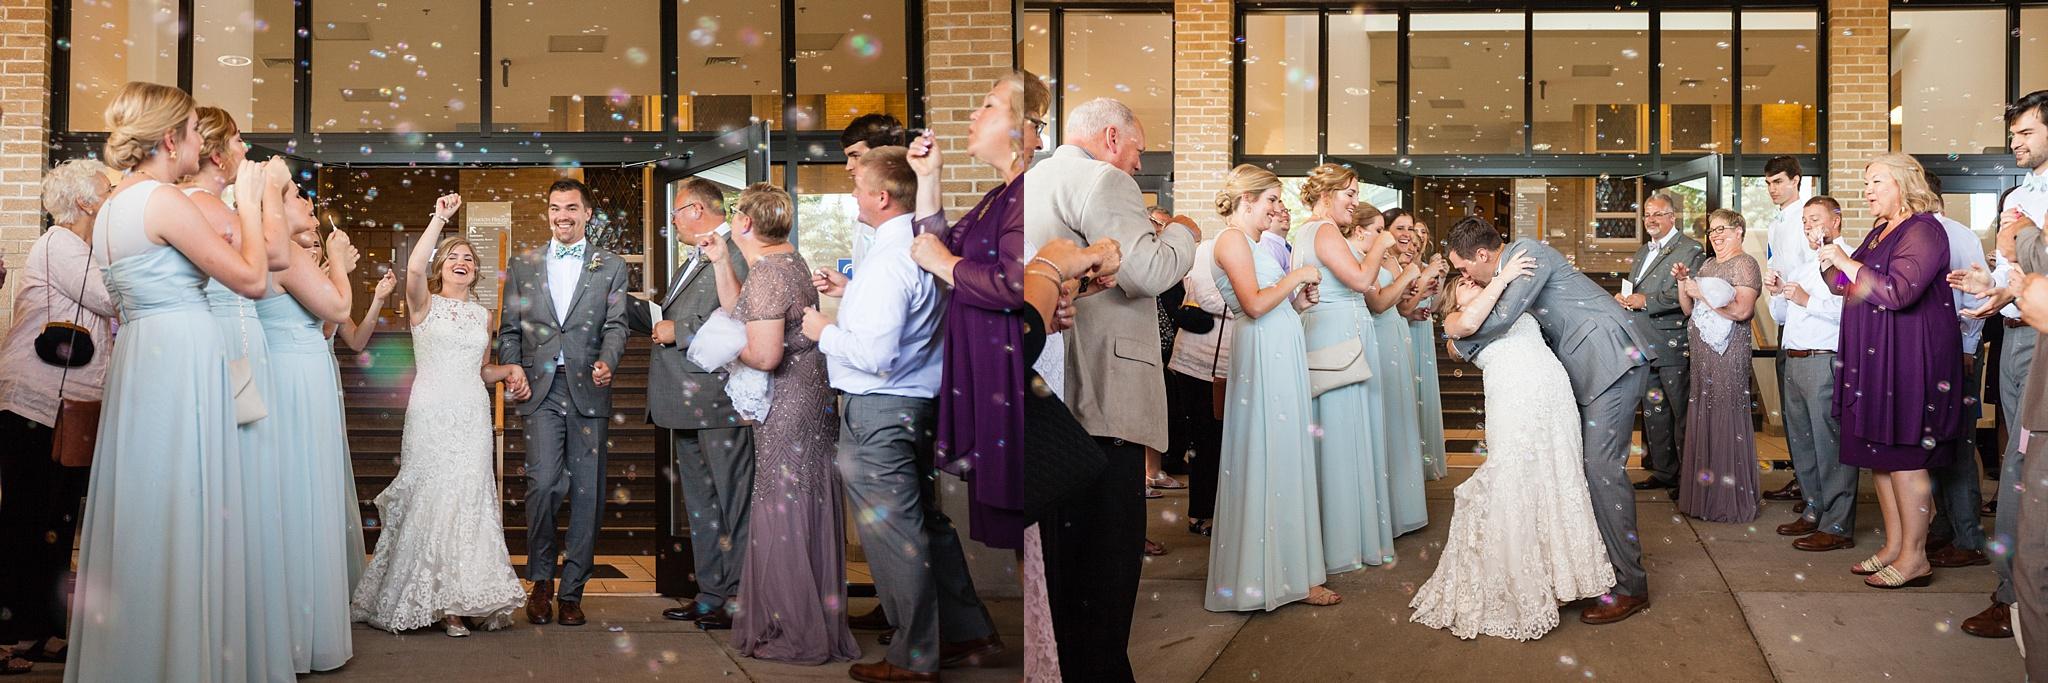 Mandi_Jack_Treehouse_Grand_Rapids_Wedding_0052.jpg